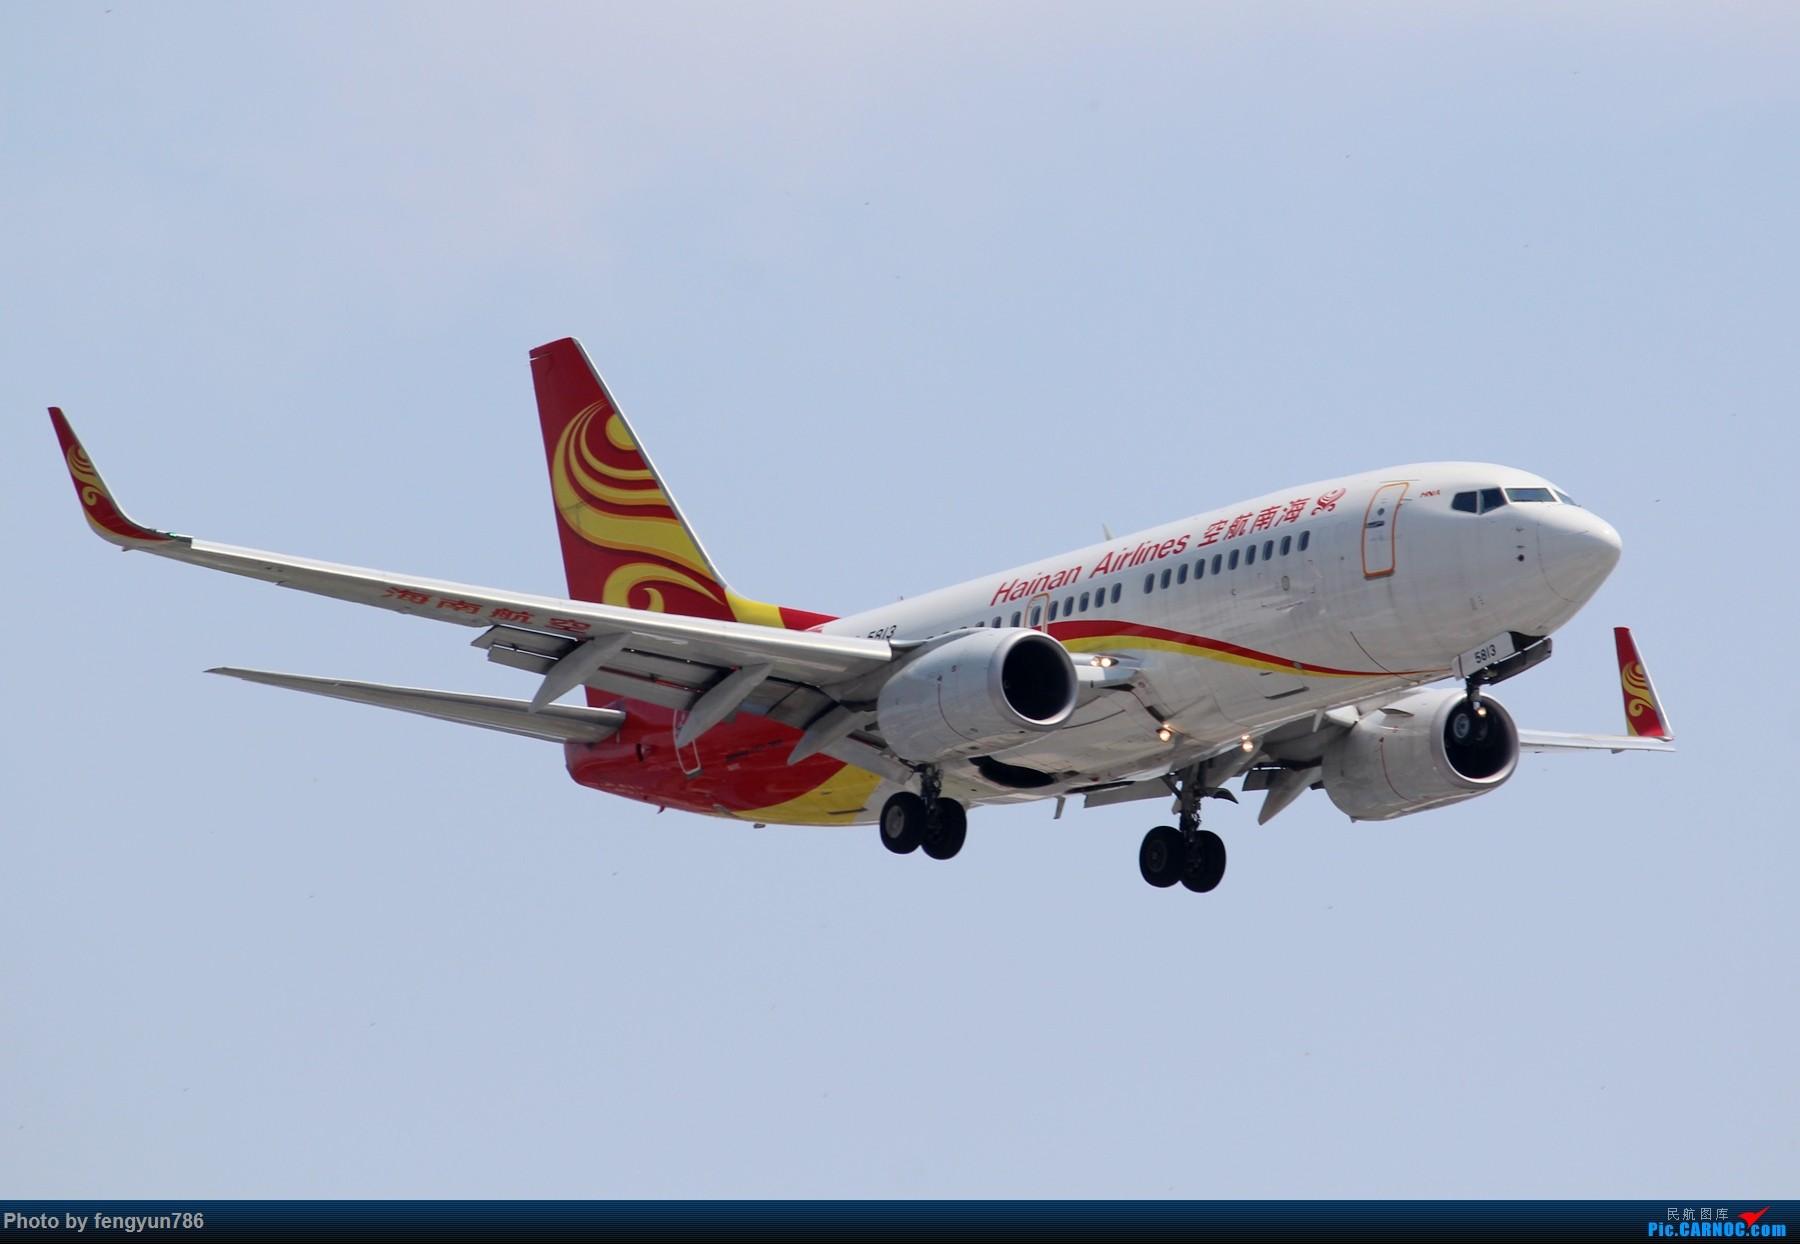 Re:[原创]7.19的SHA,天晴温高,发几个跟前一天不一样的。 BOEING 737-700 B-5813 中国上海虹桥国际机场